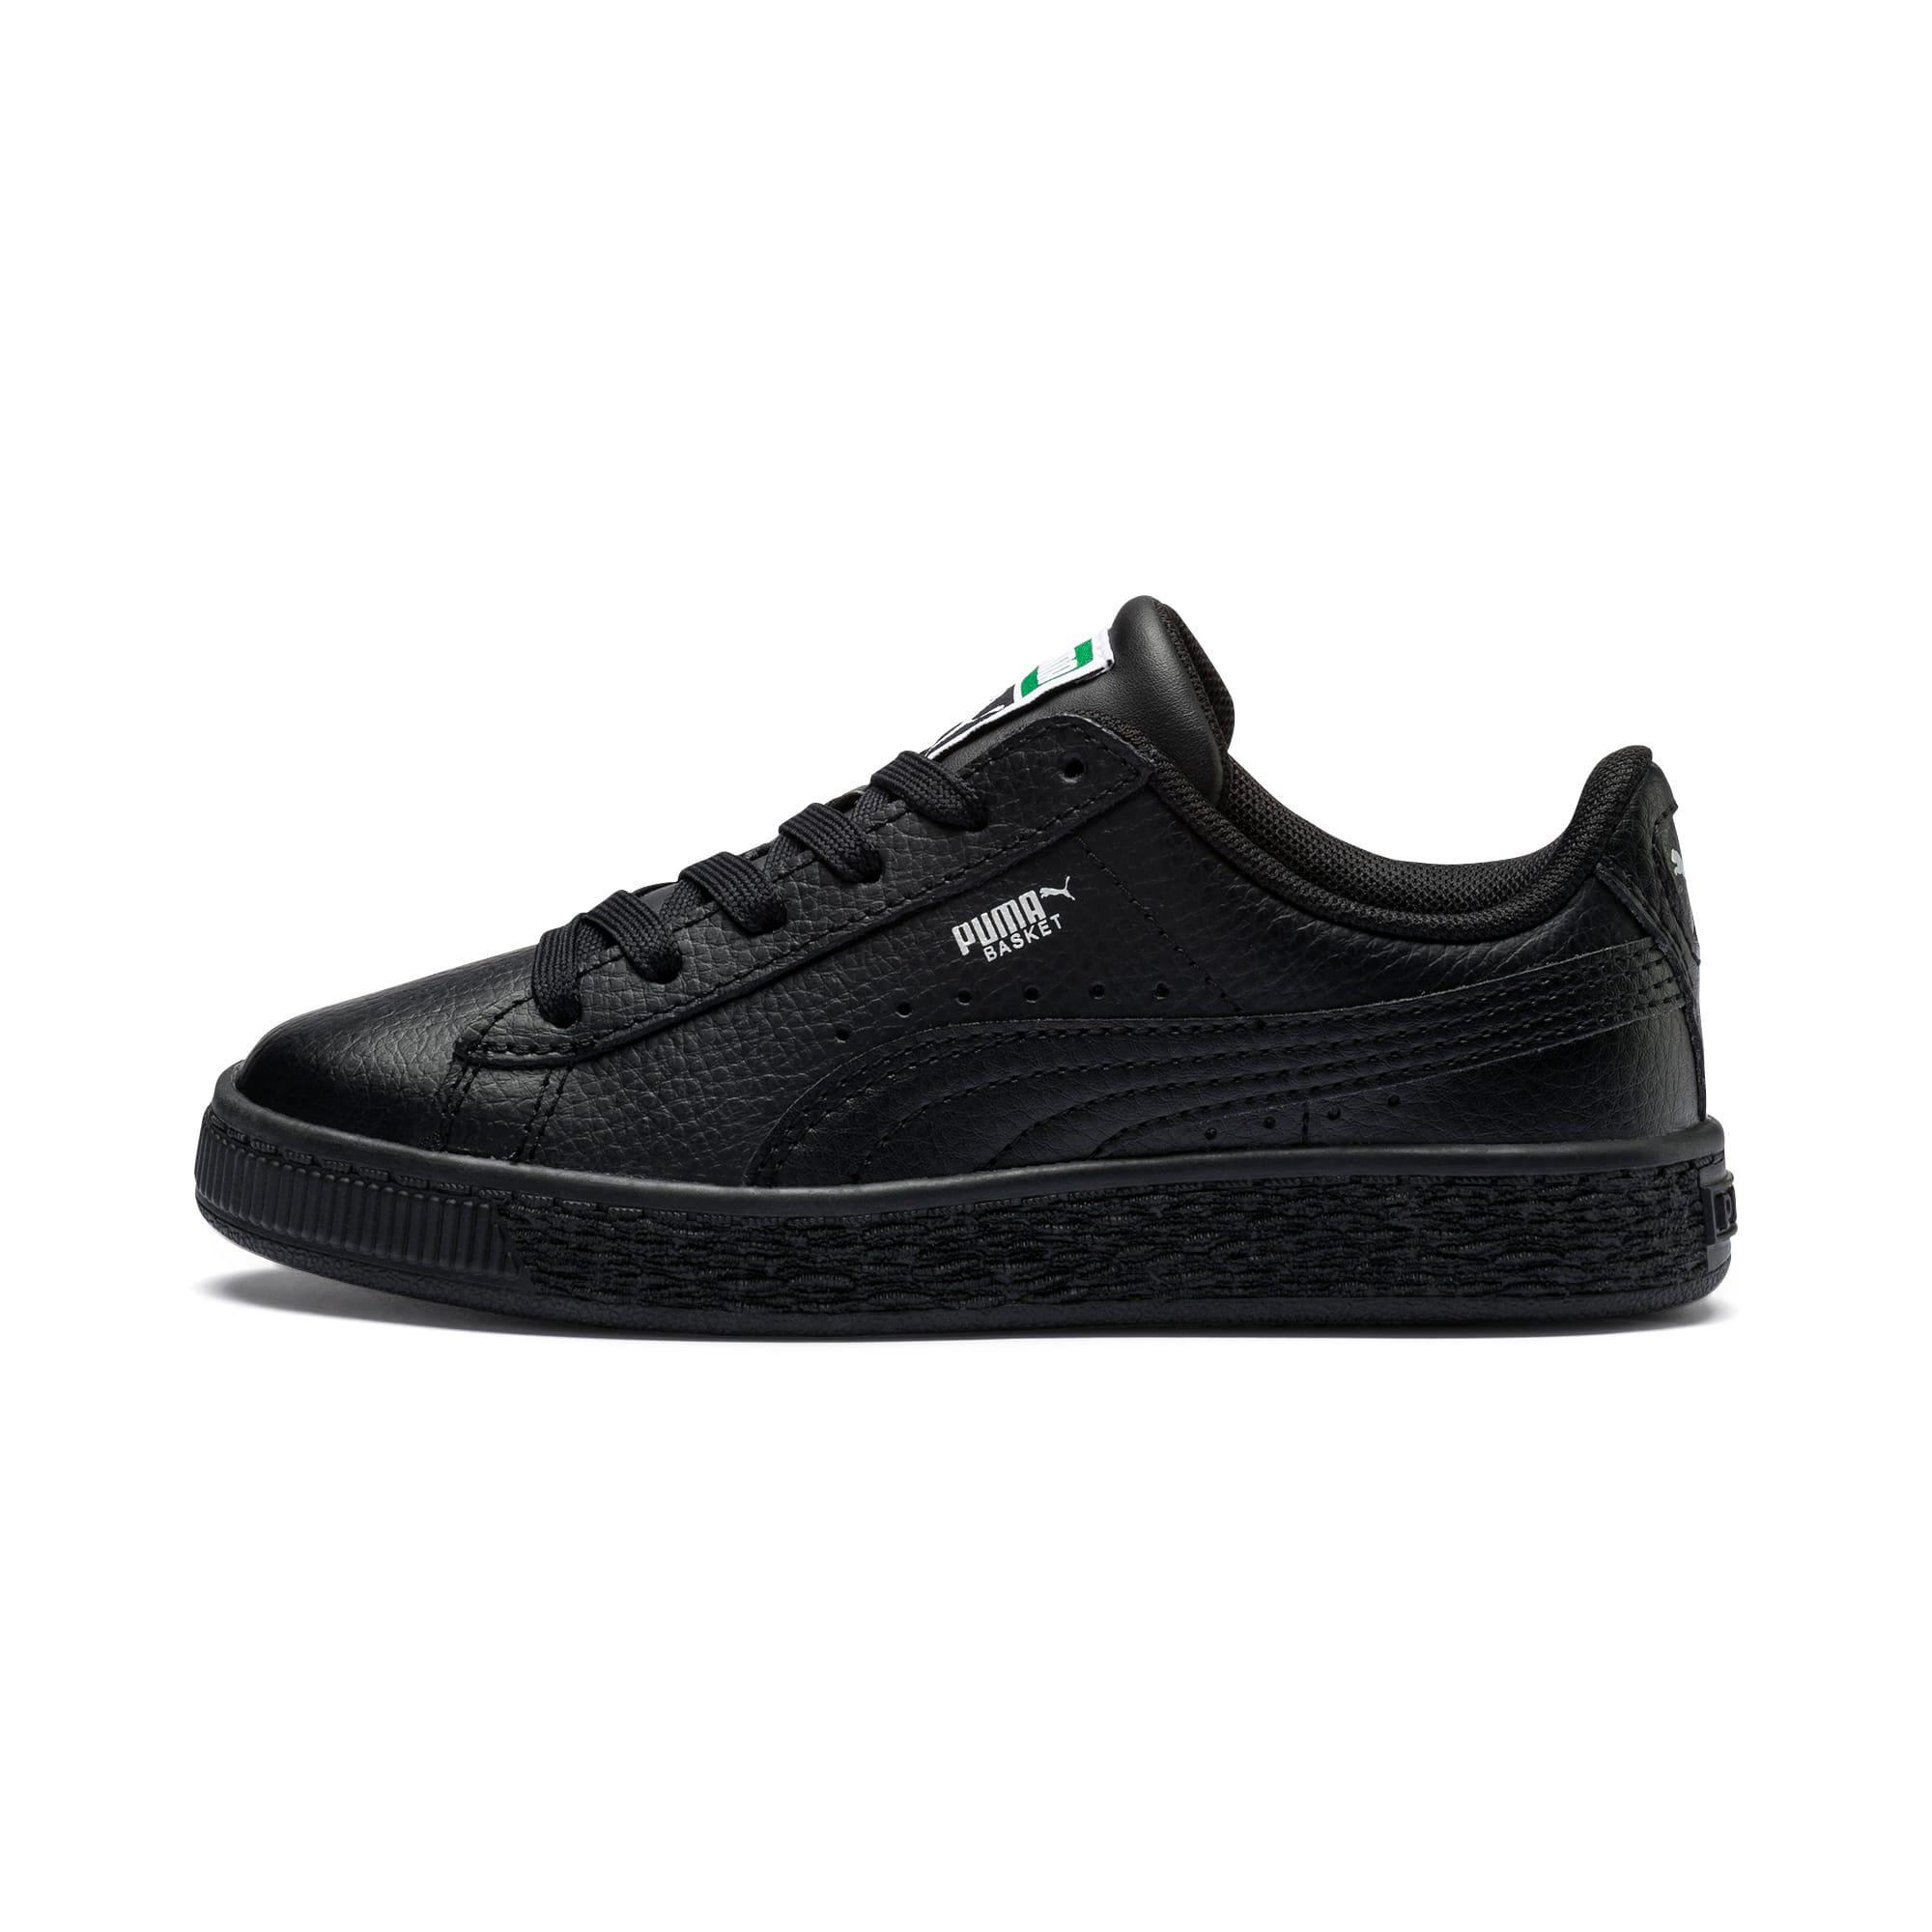 Puma Basket Classic Kids' Trainers, Black, size 10.5, Shoes